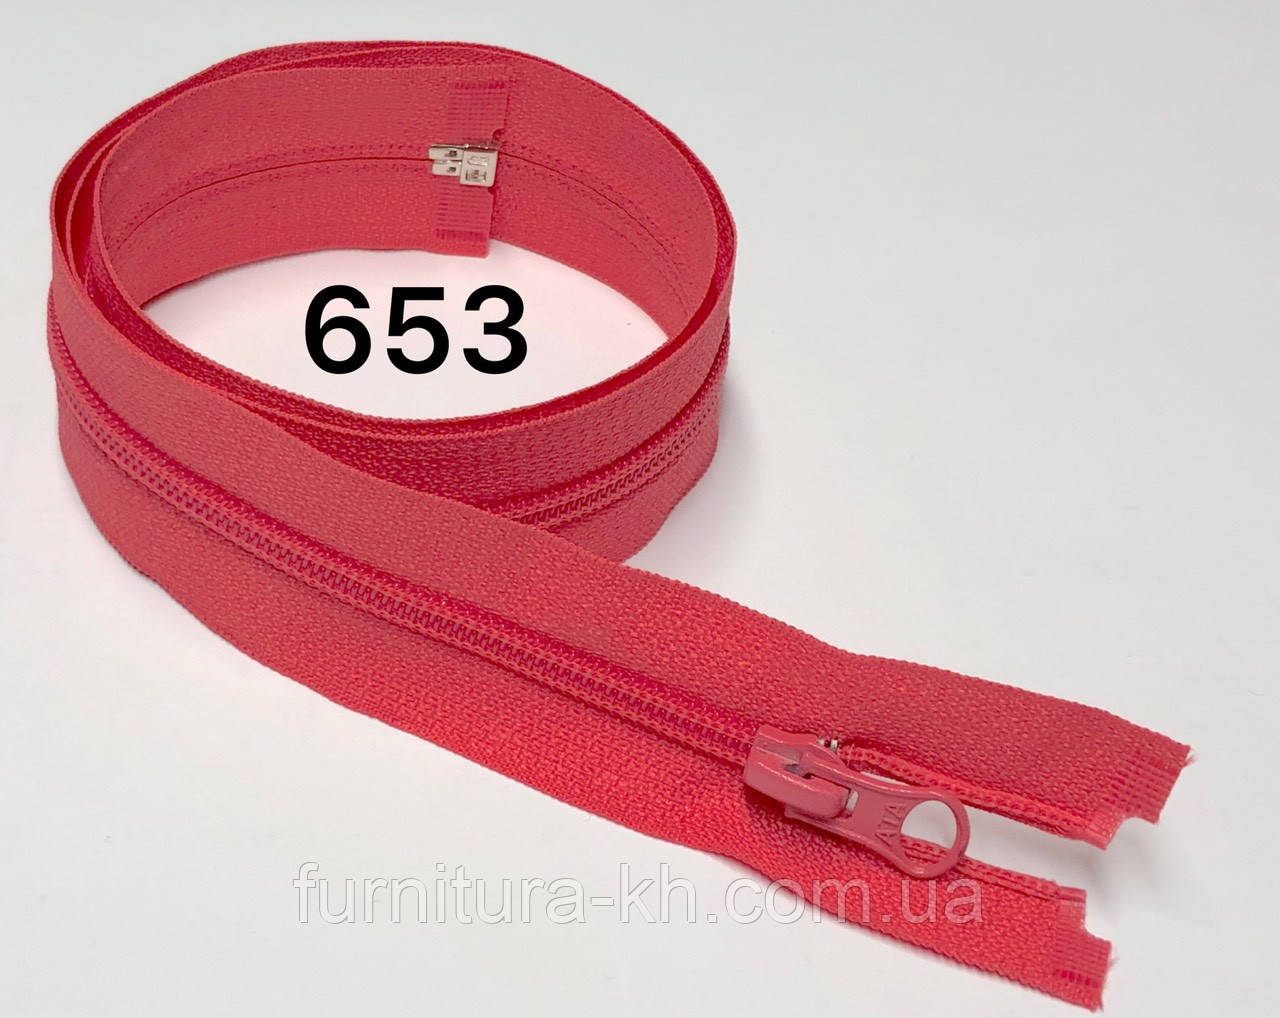 Спираль Тип 5-Длинна 65 см.Цвет 653